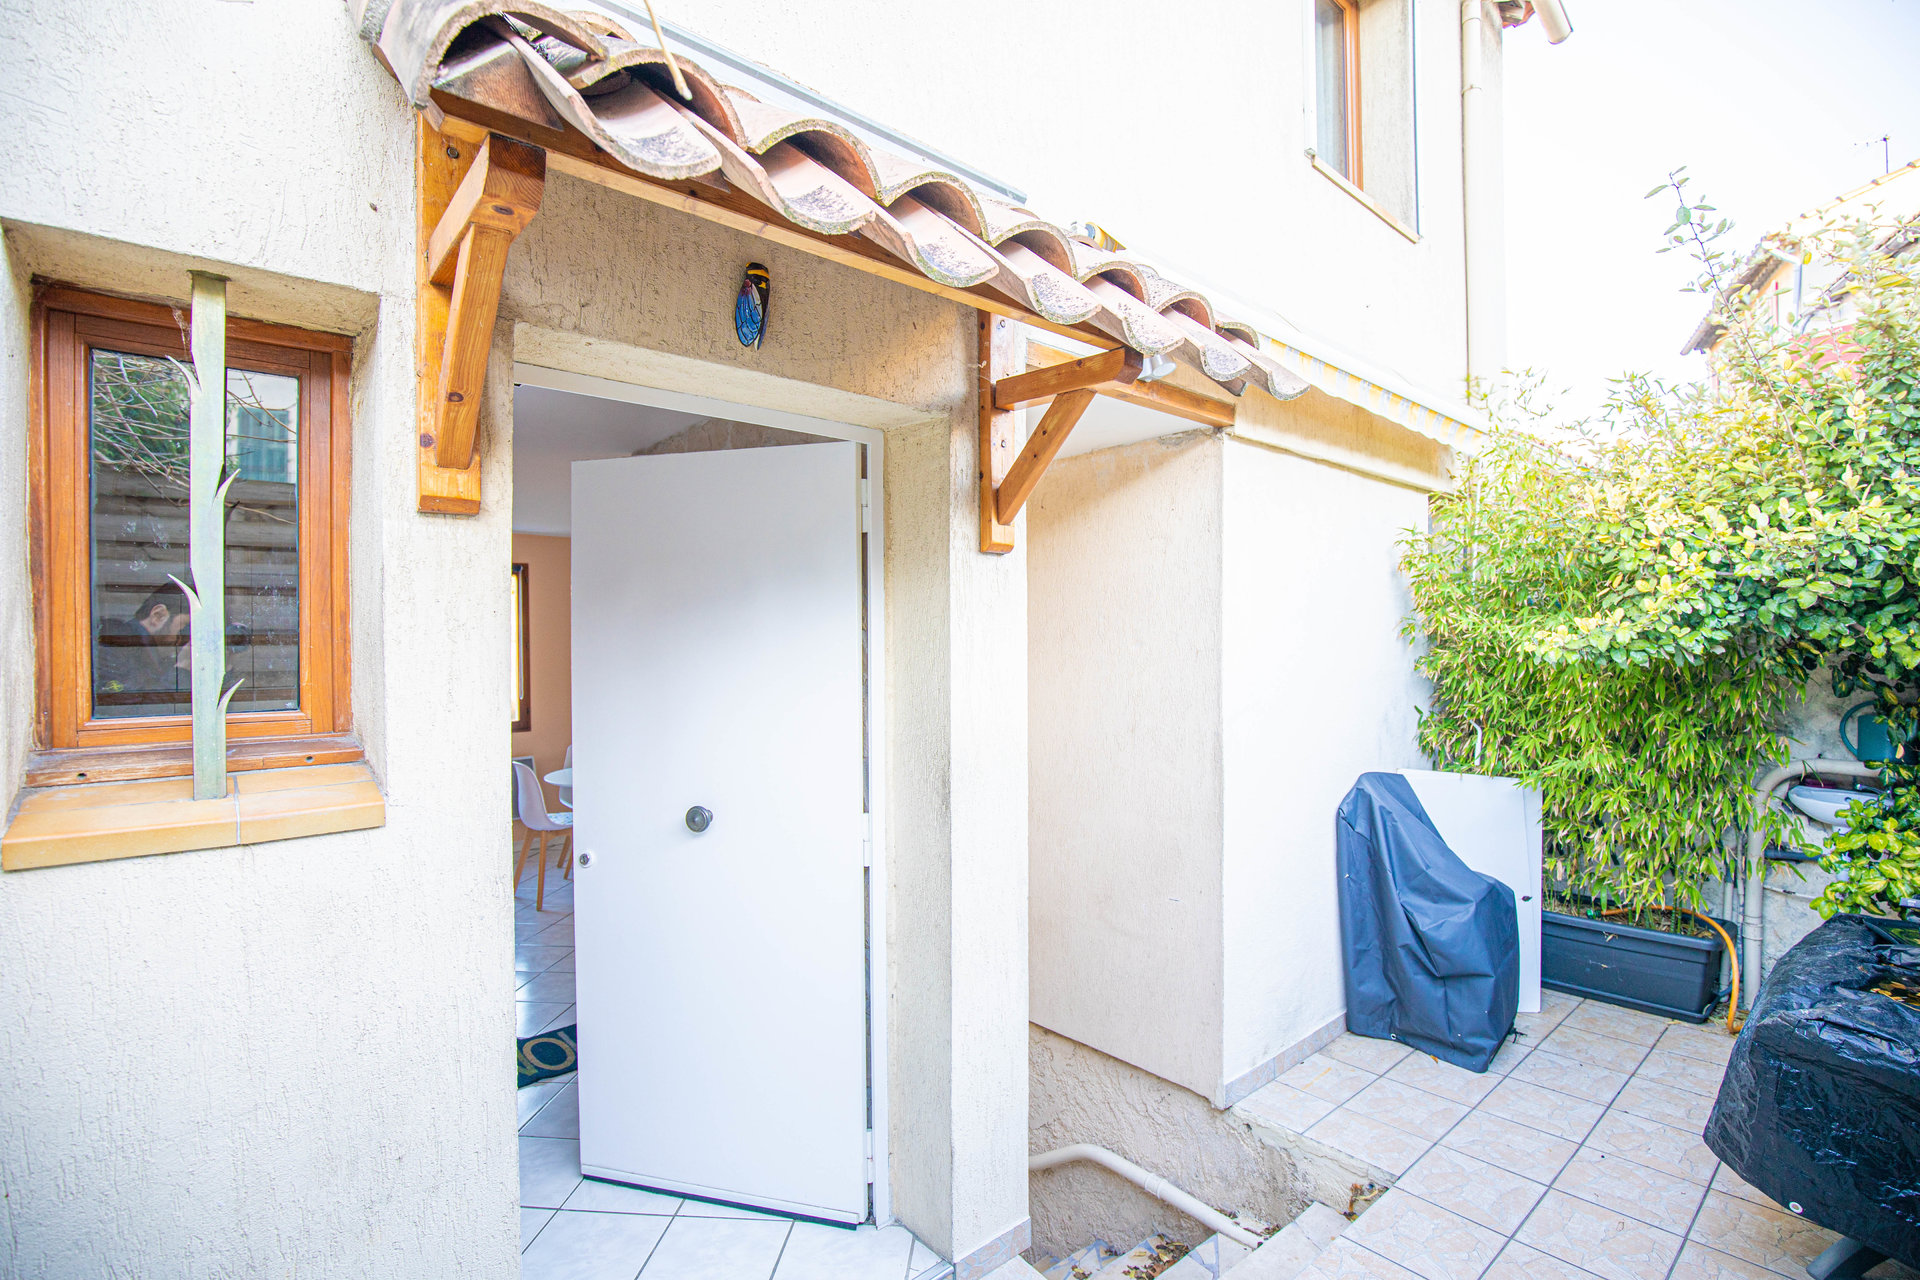 Vendita Casa di paese - Marseille 11ème Saint-Marcel